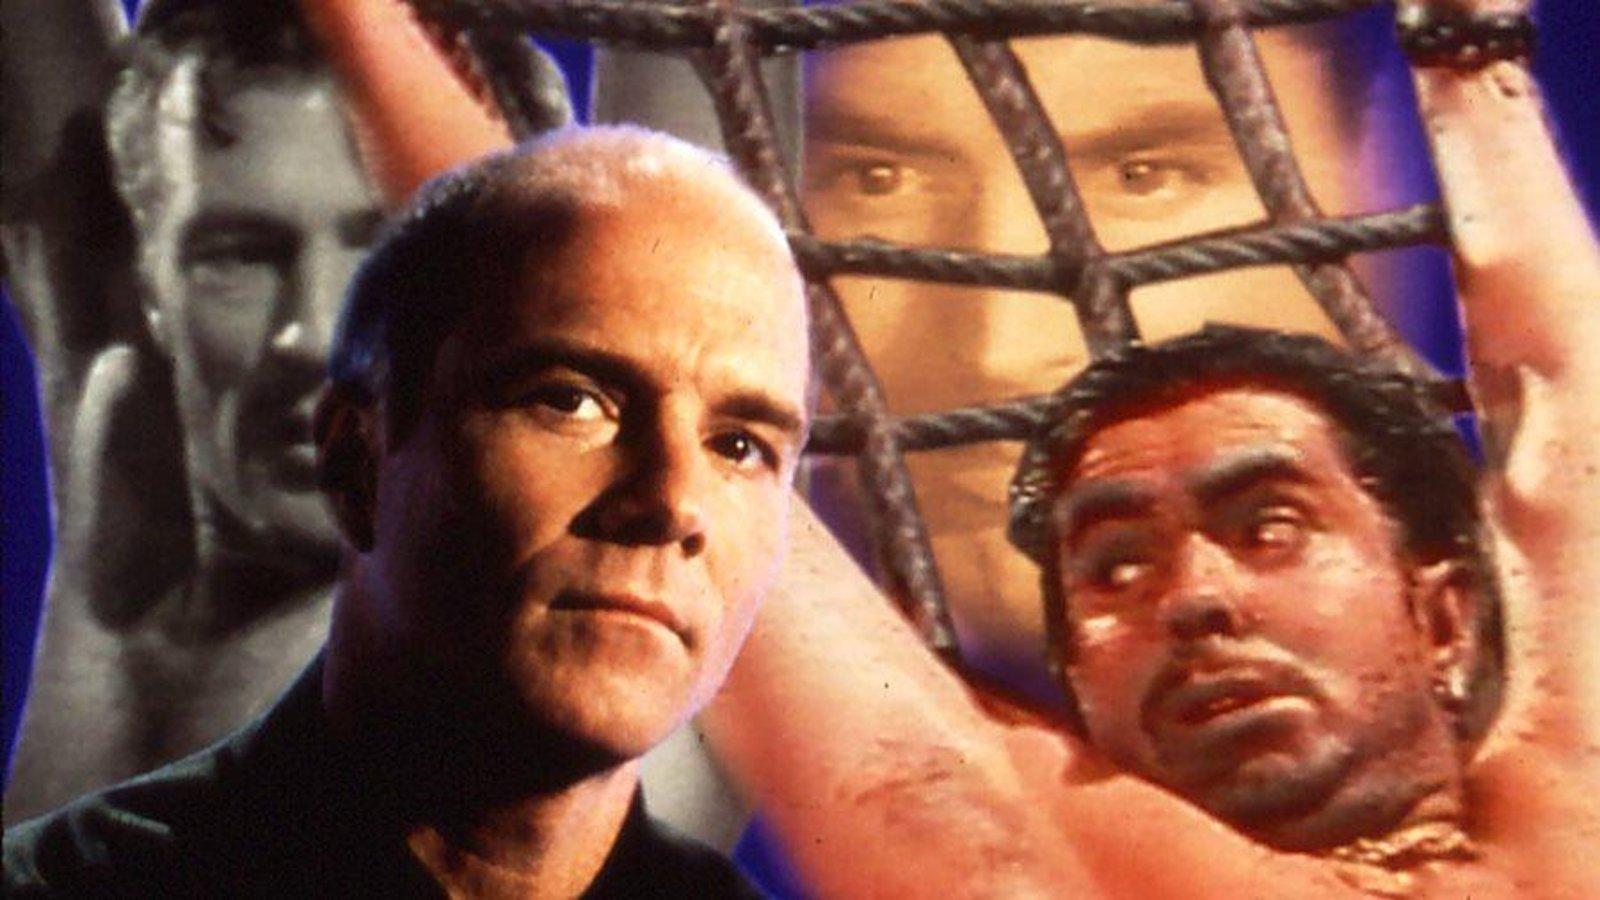 The Silver Screen - Color Me Lavender - Homosexual Overtones in Classic Cinema